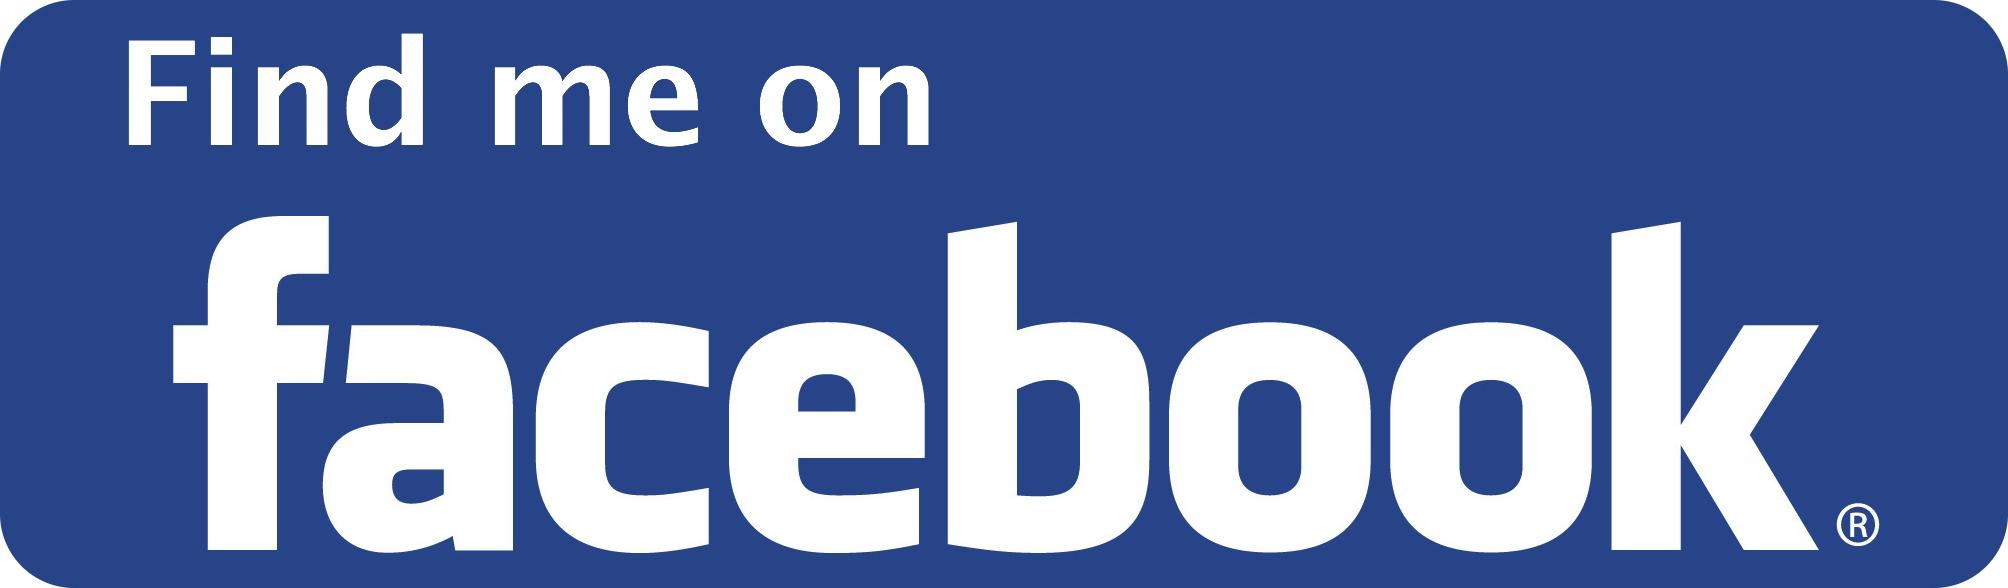 facebookFindMe.jpg